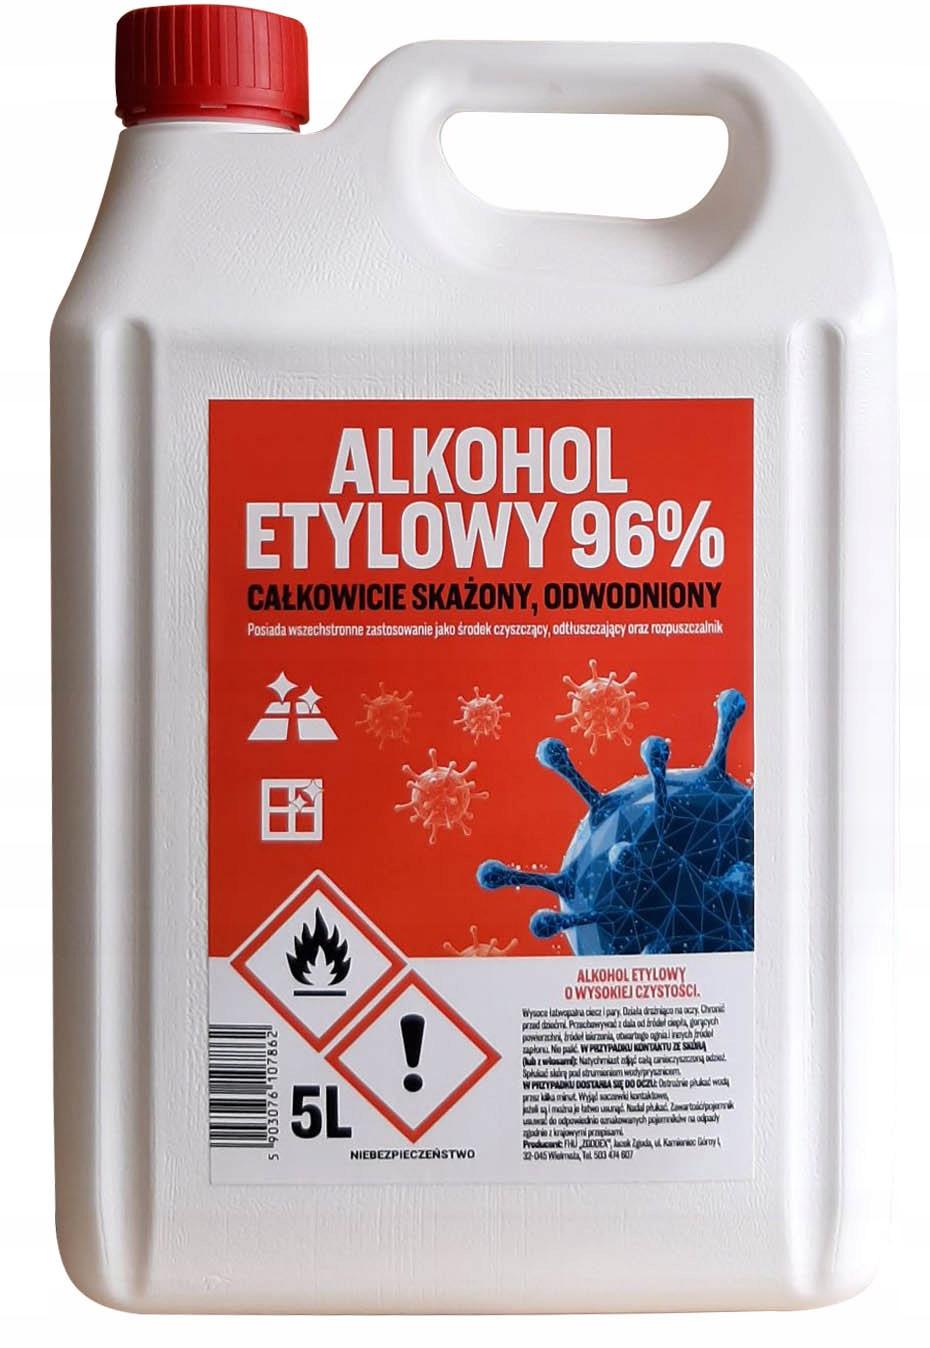 ALKOHOL ETYLOWY ETANOL DEZYNFEKCJA SPIRYTUS 96% 5l 9611615877 - Allegro.pl